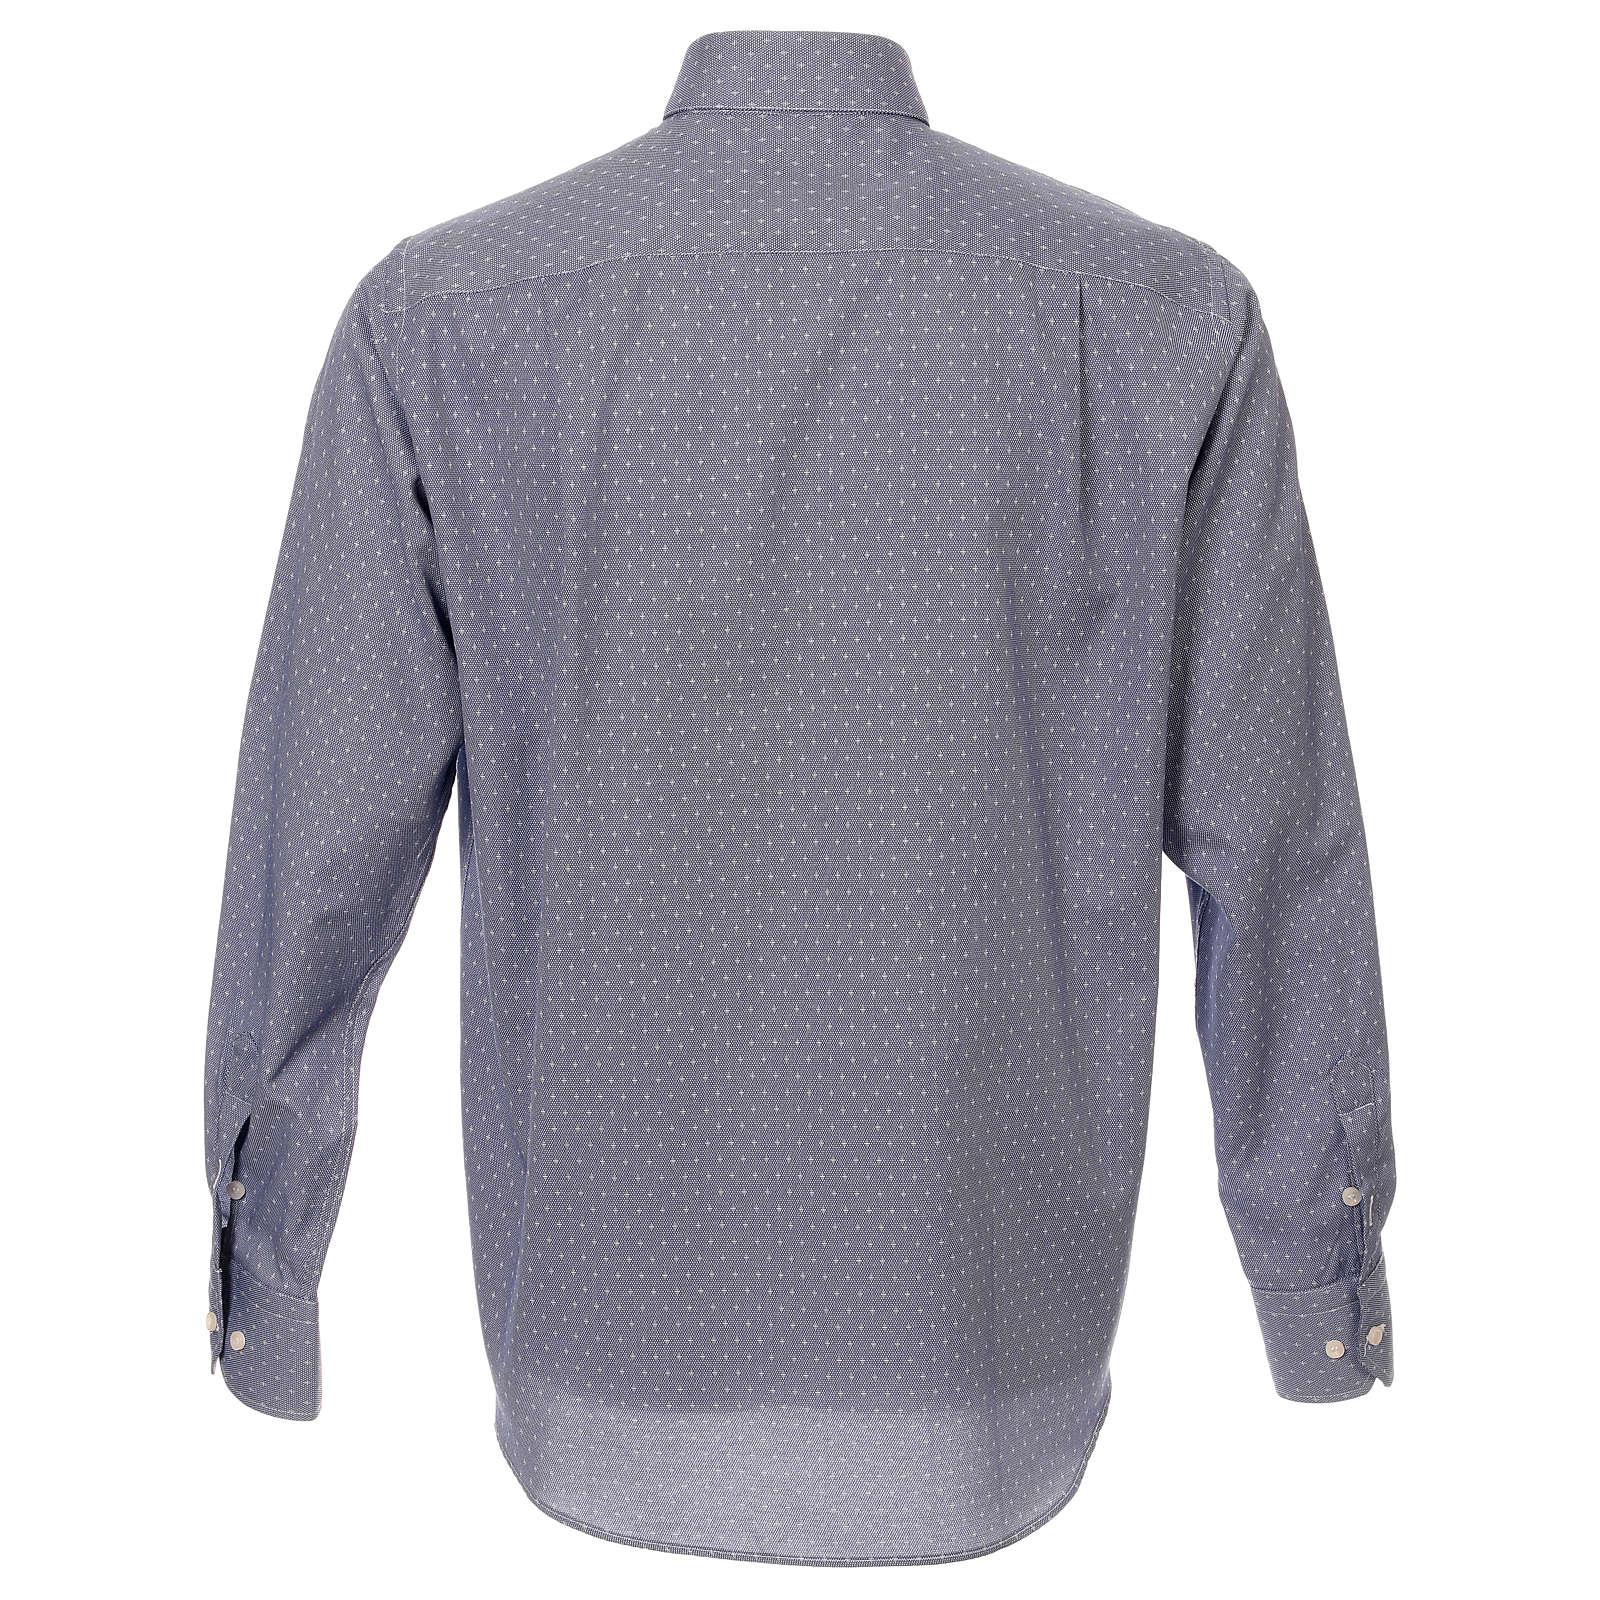 Camicia collo clergy tessuto croci blu M. Lunga 4